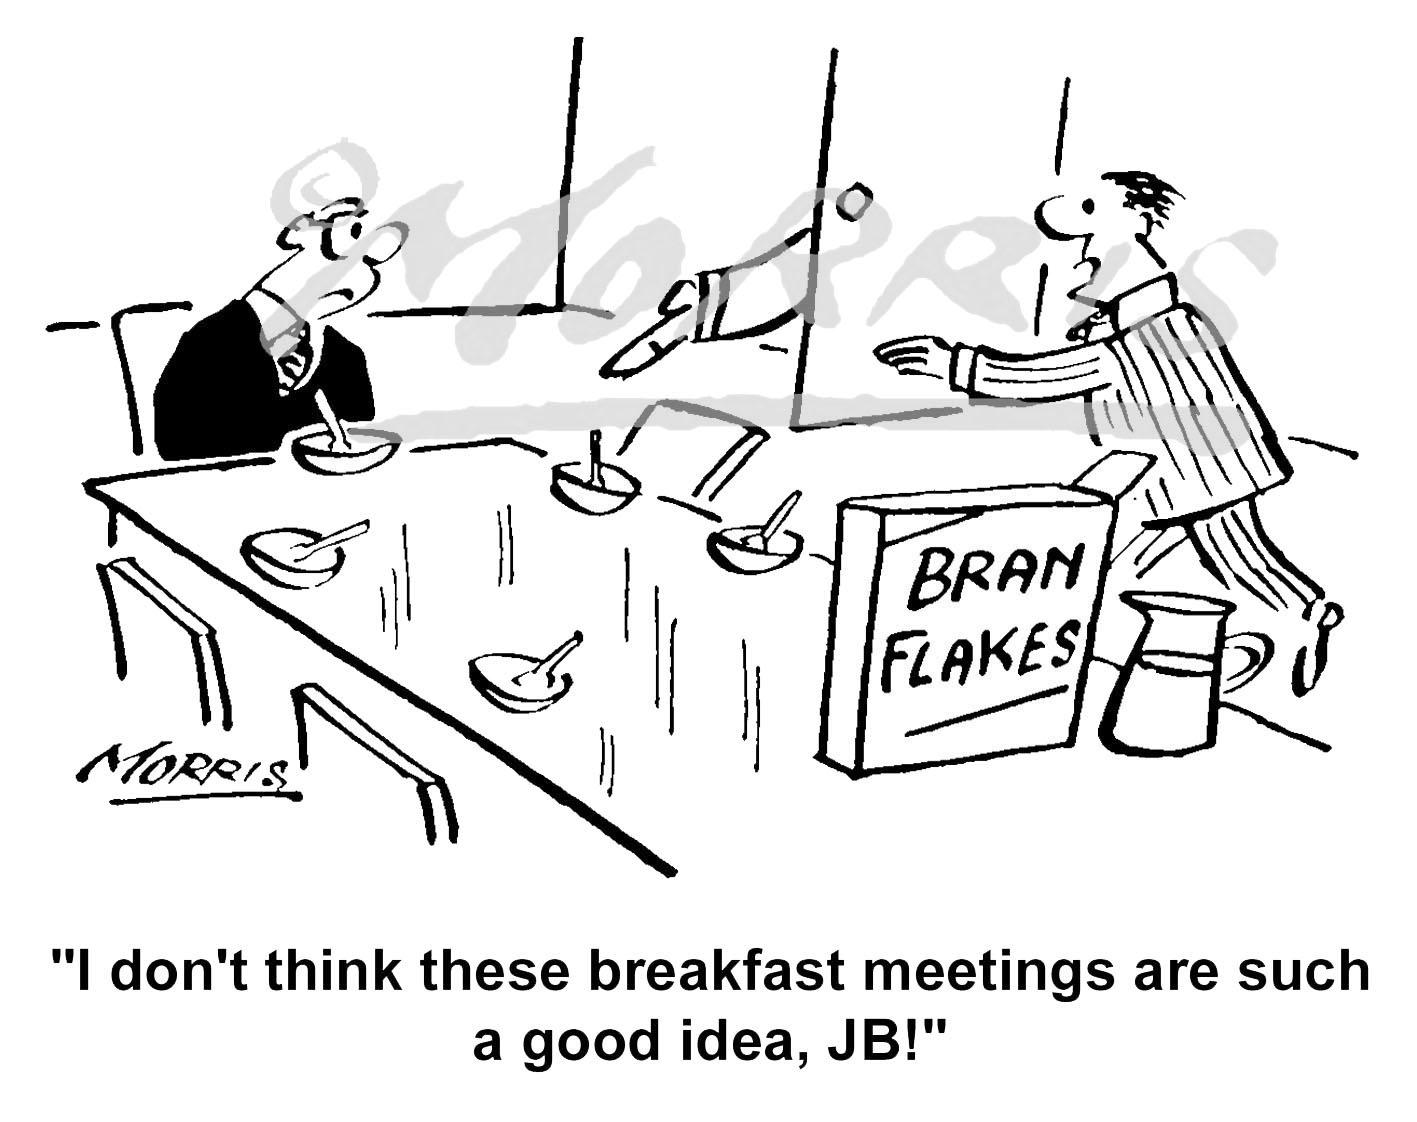 Boardroom breakfast meeting cartoon Ref: 1489bw